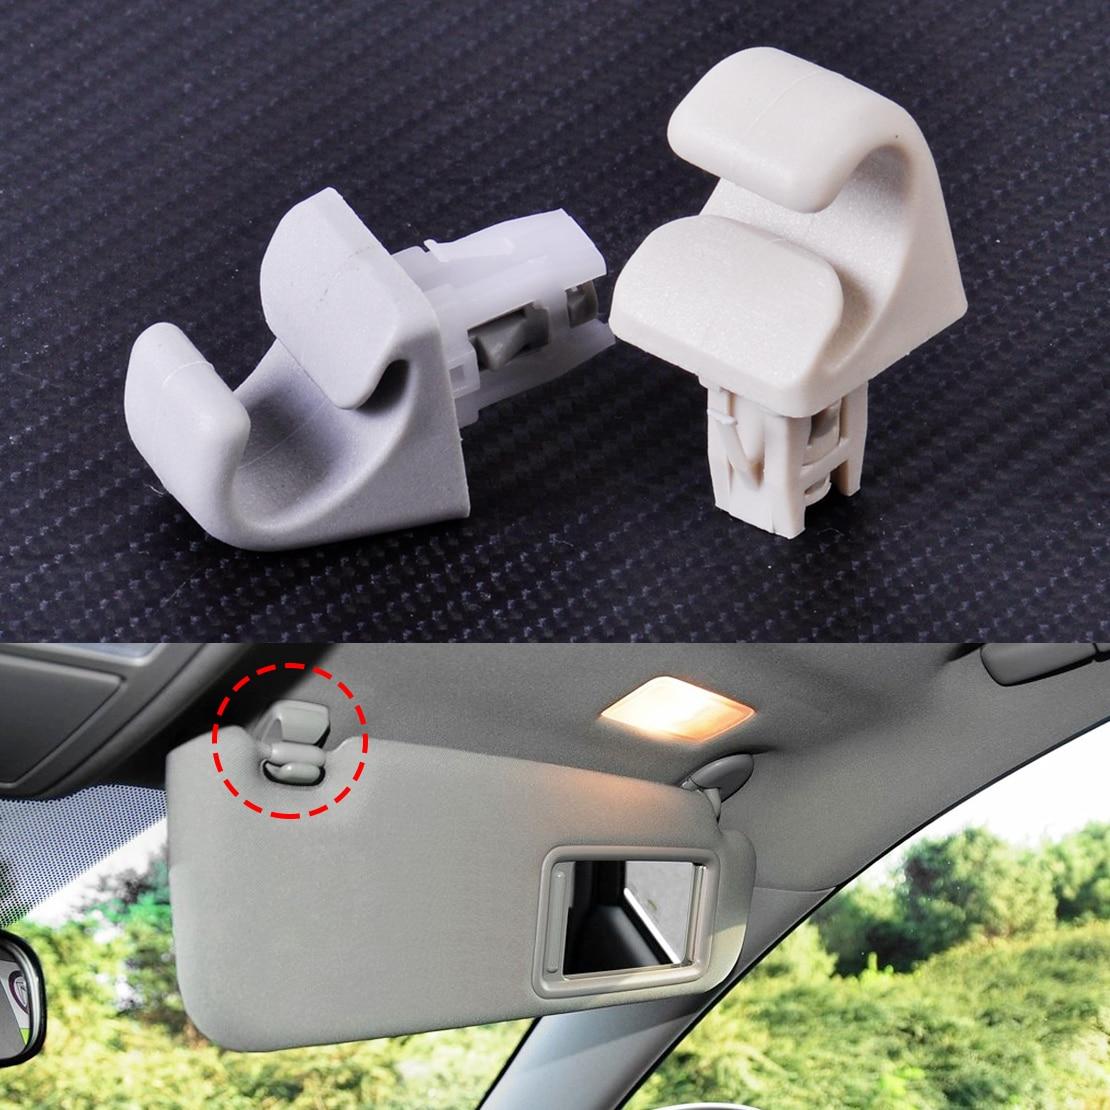 CITALL Kunststoff Sonnenblende Haken Clip Halterung Aufhänger Fit für Toyota Camry Corolla Corolla Matrix Highlander Prius RAV4 Solara